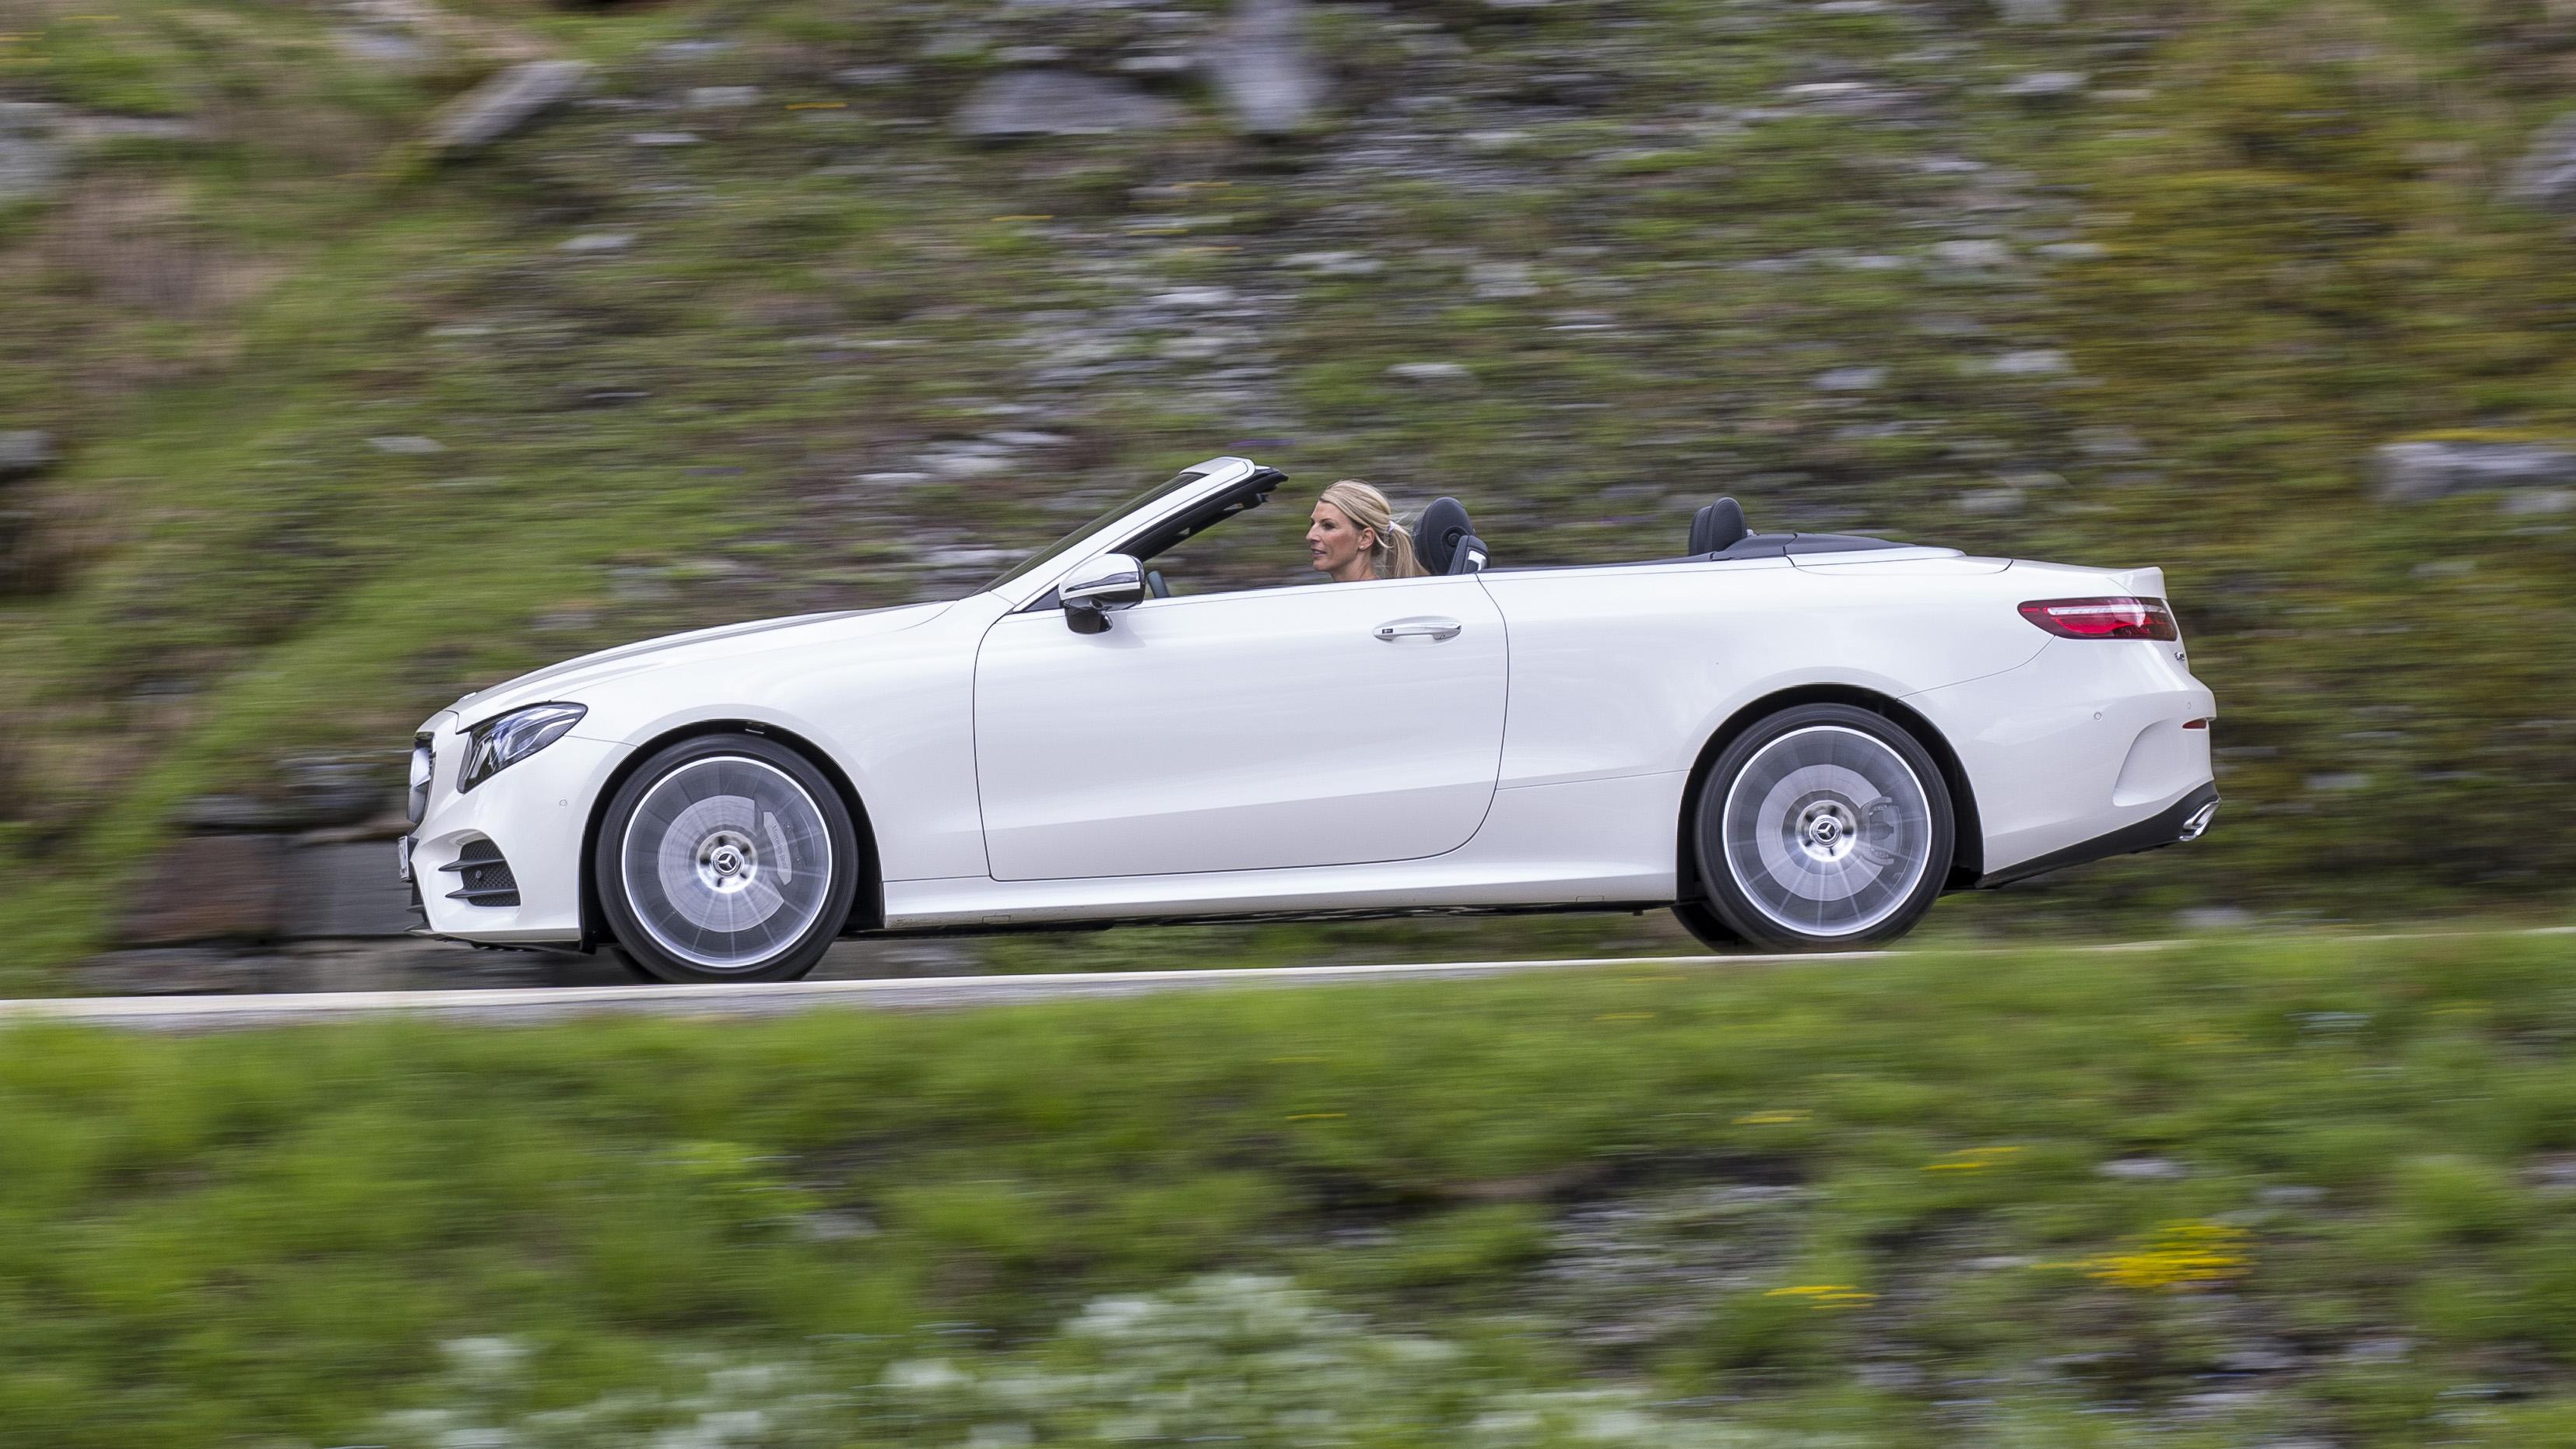 e walkaround interior watch benz motor youtube class convertible frankfurt show mercedes exterior cabrio